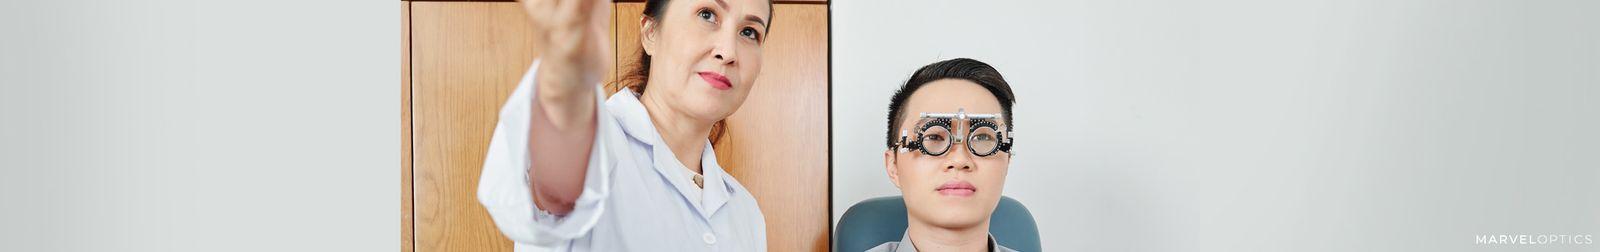 Understanding Your Eyeglass Prescription Header